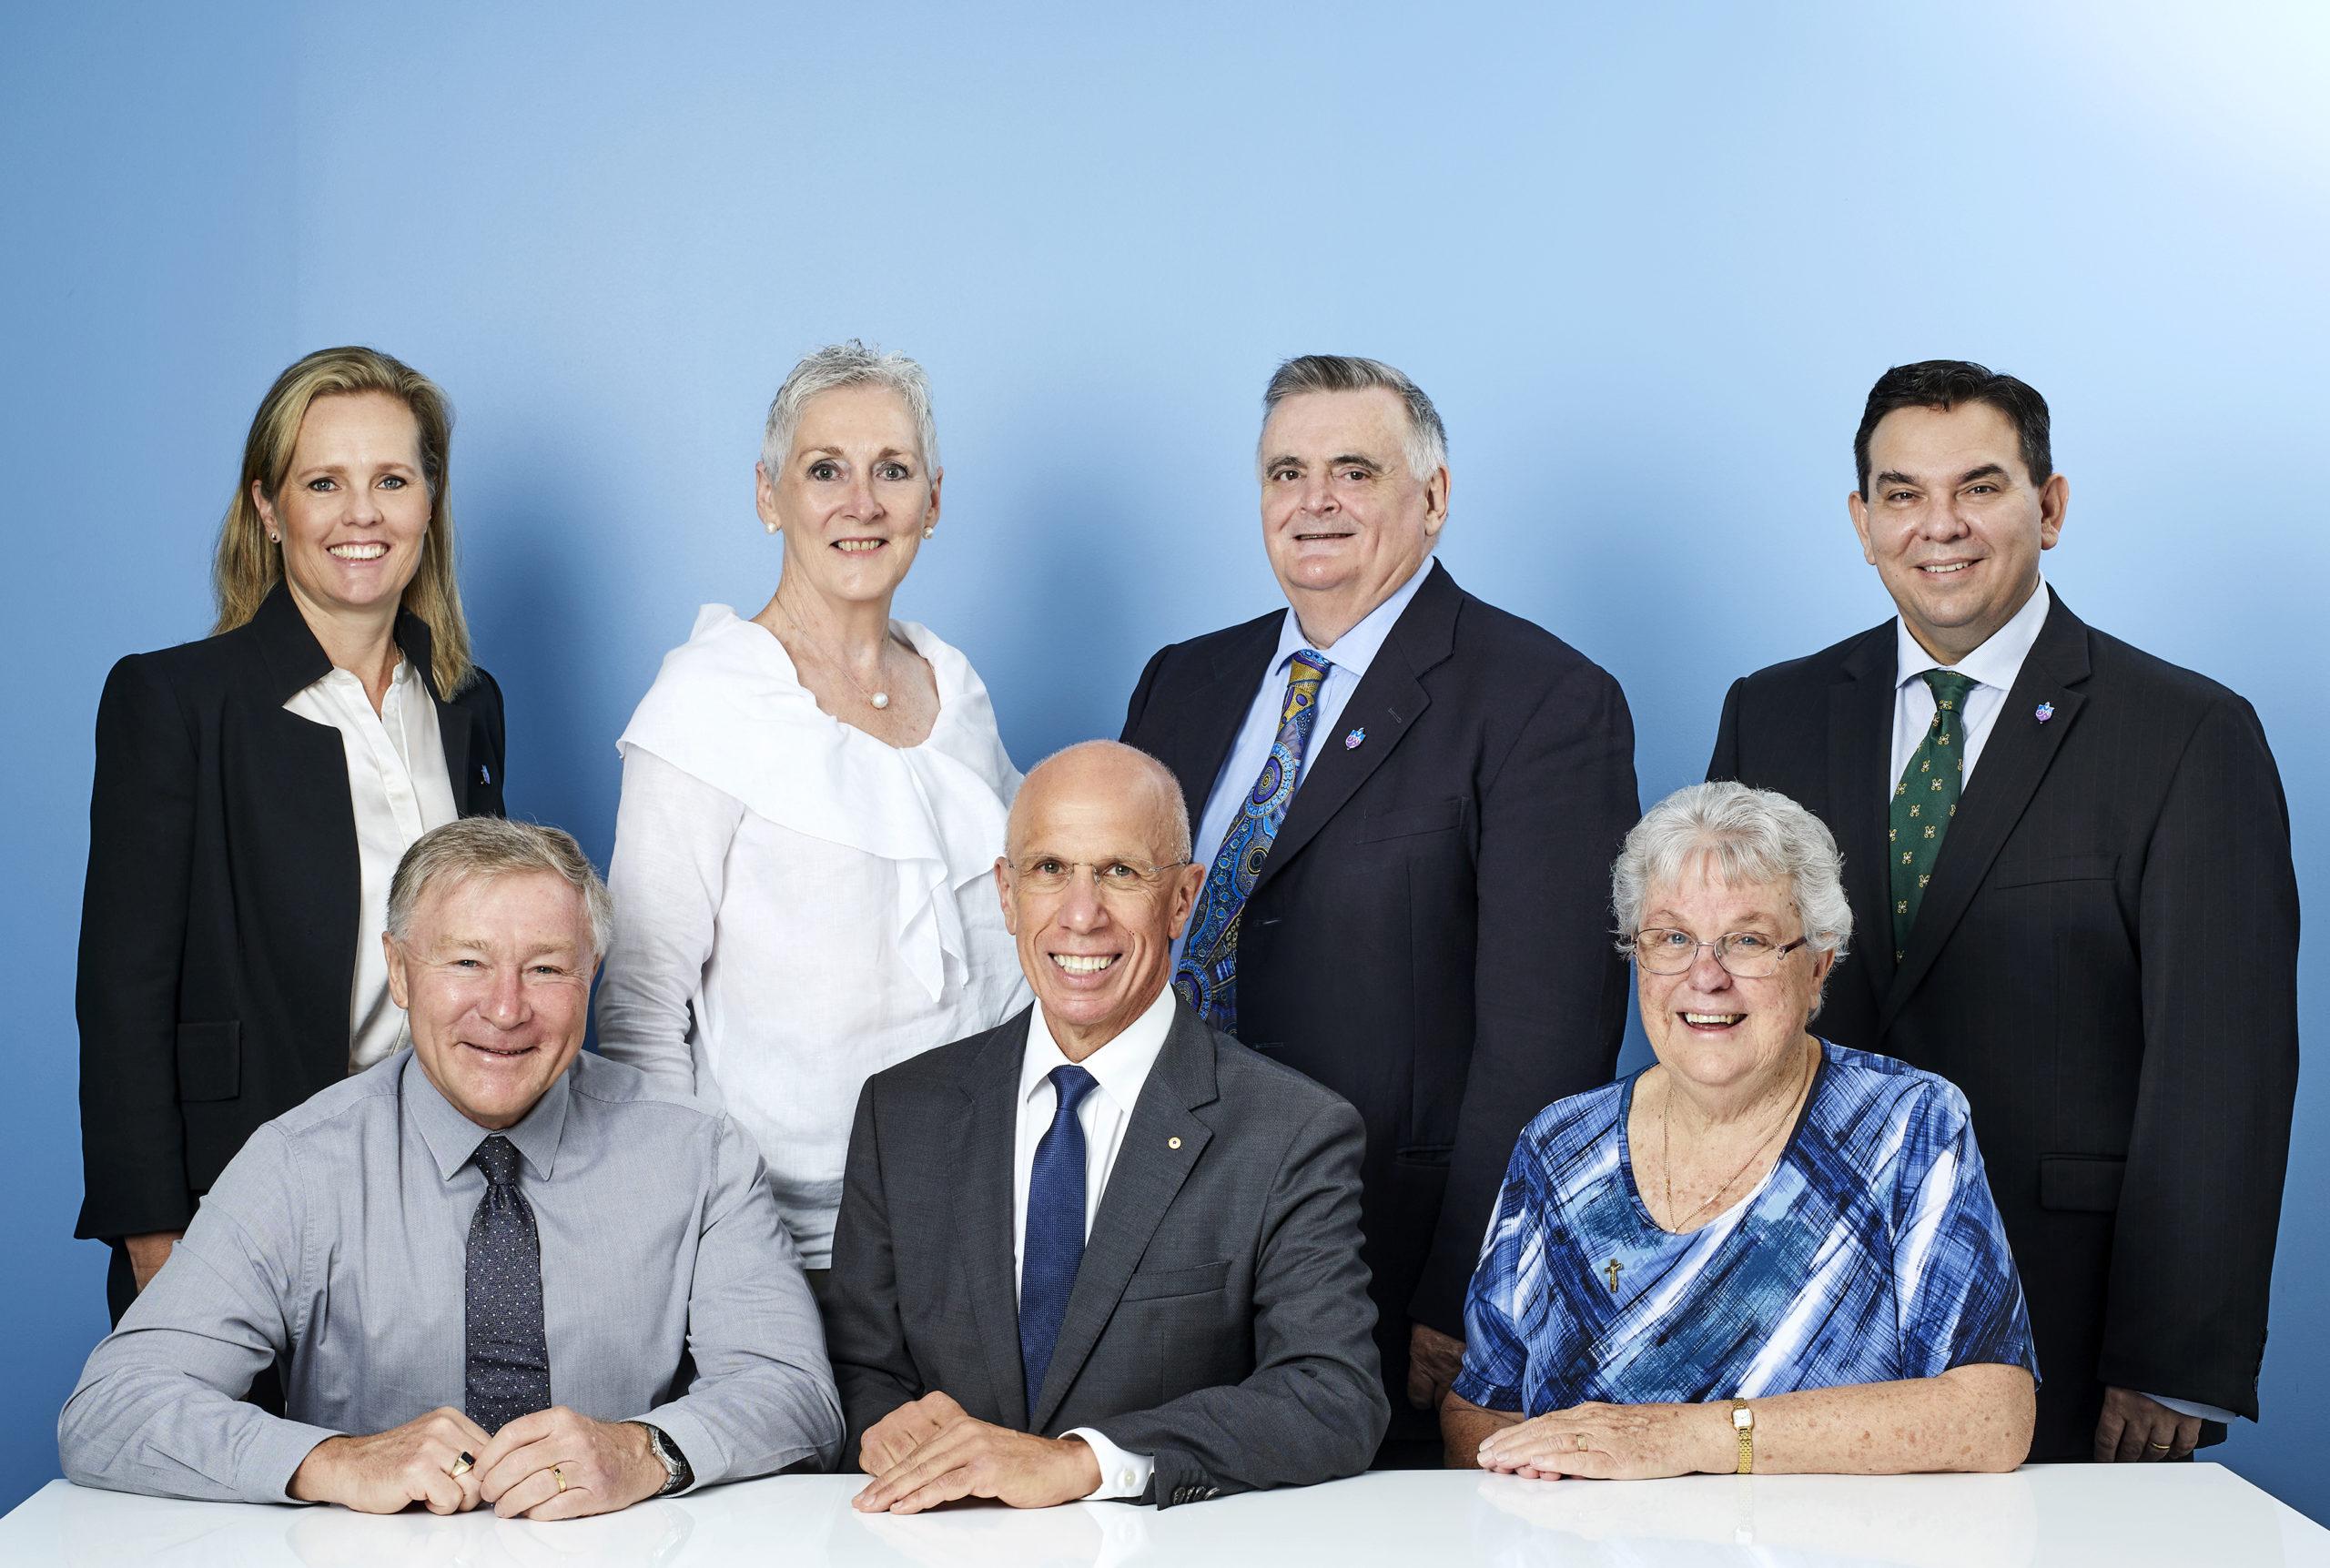 MAM, Trustees, Sydney, February 2020